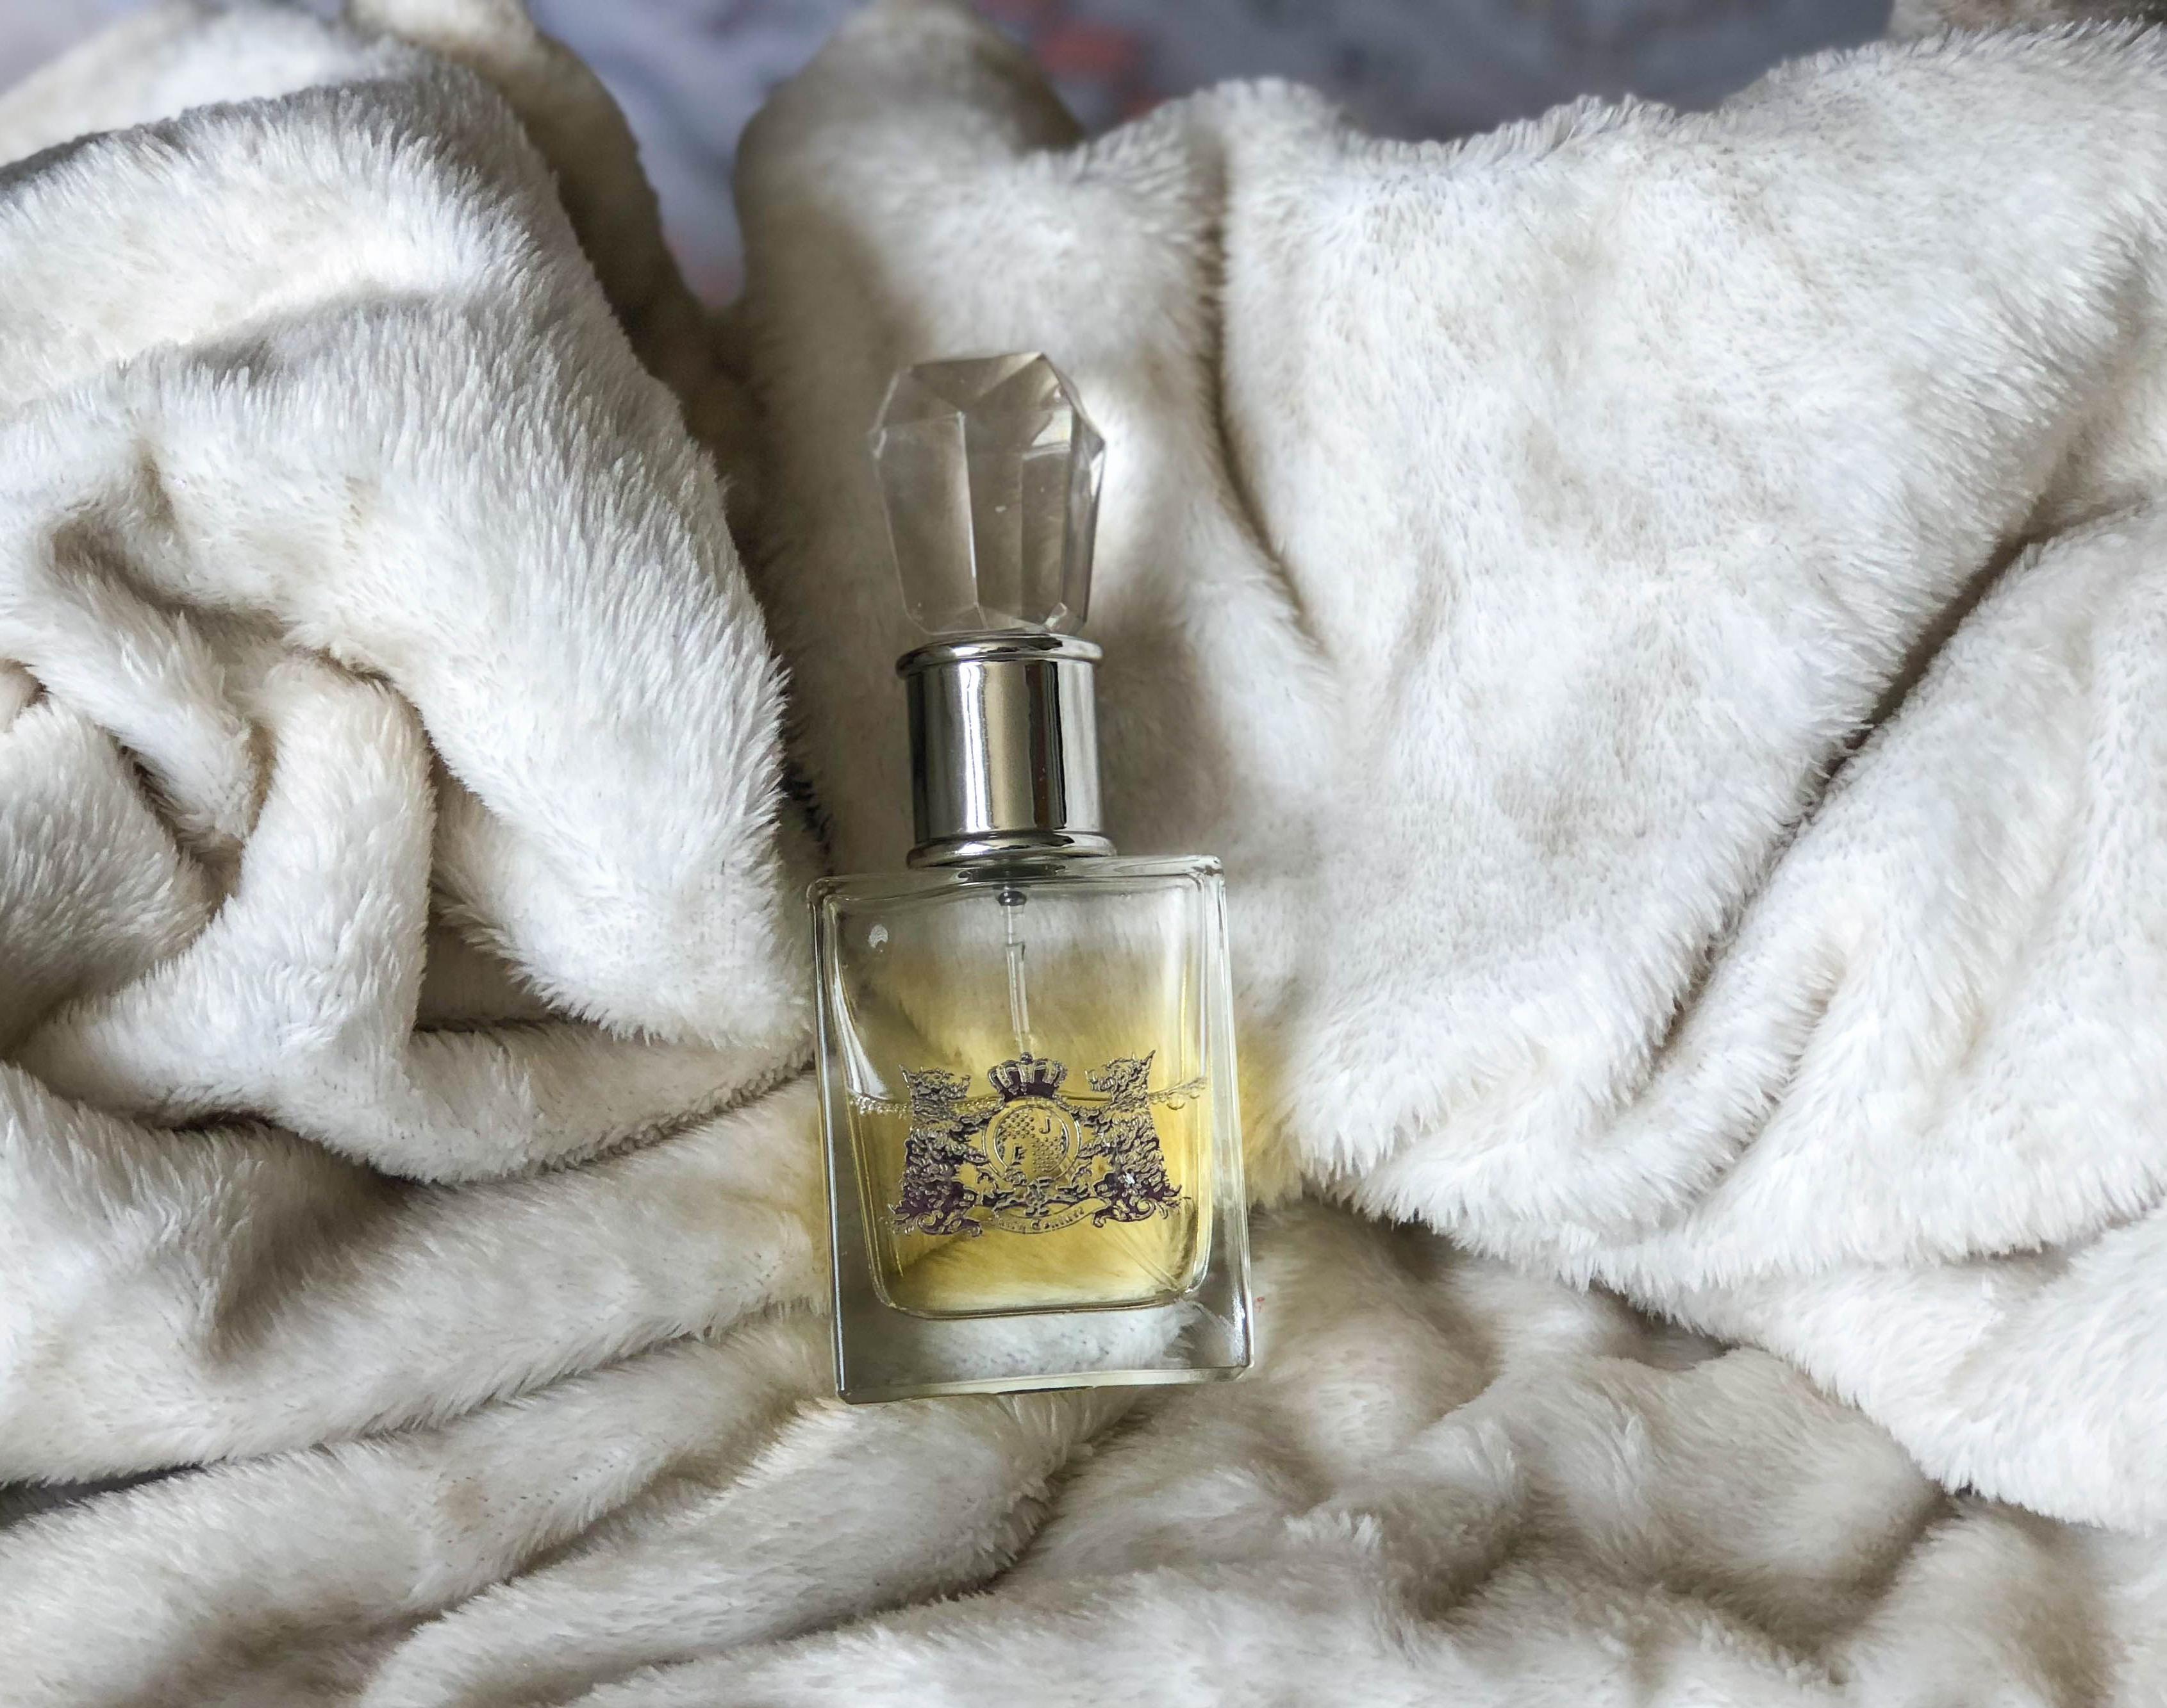 perfume (1 of 1)